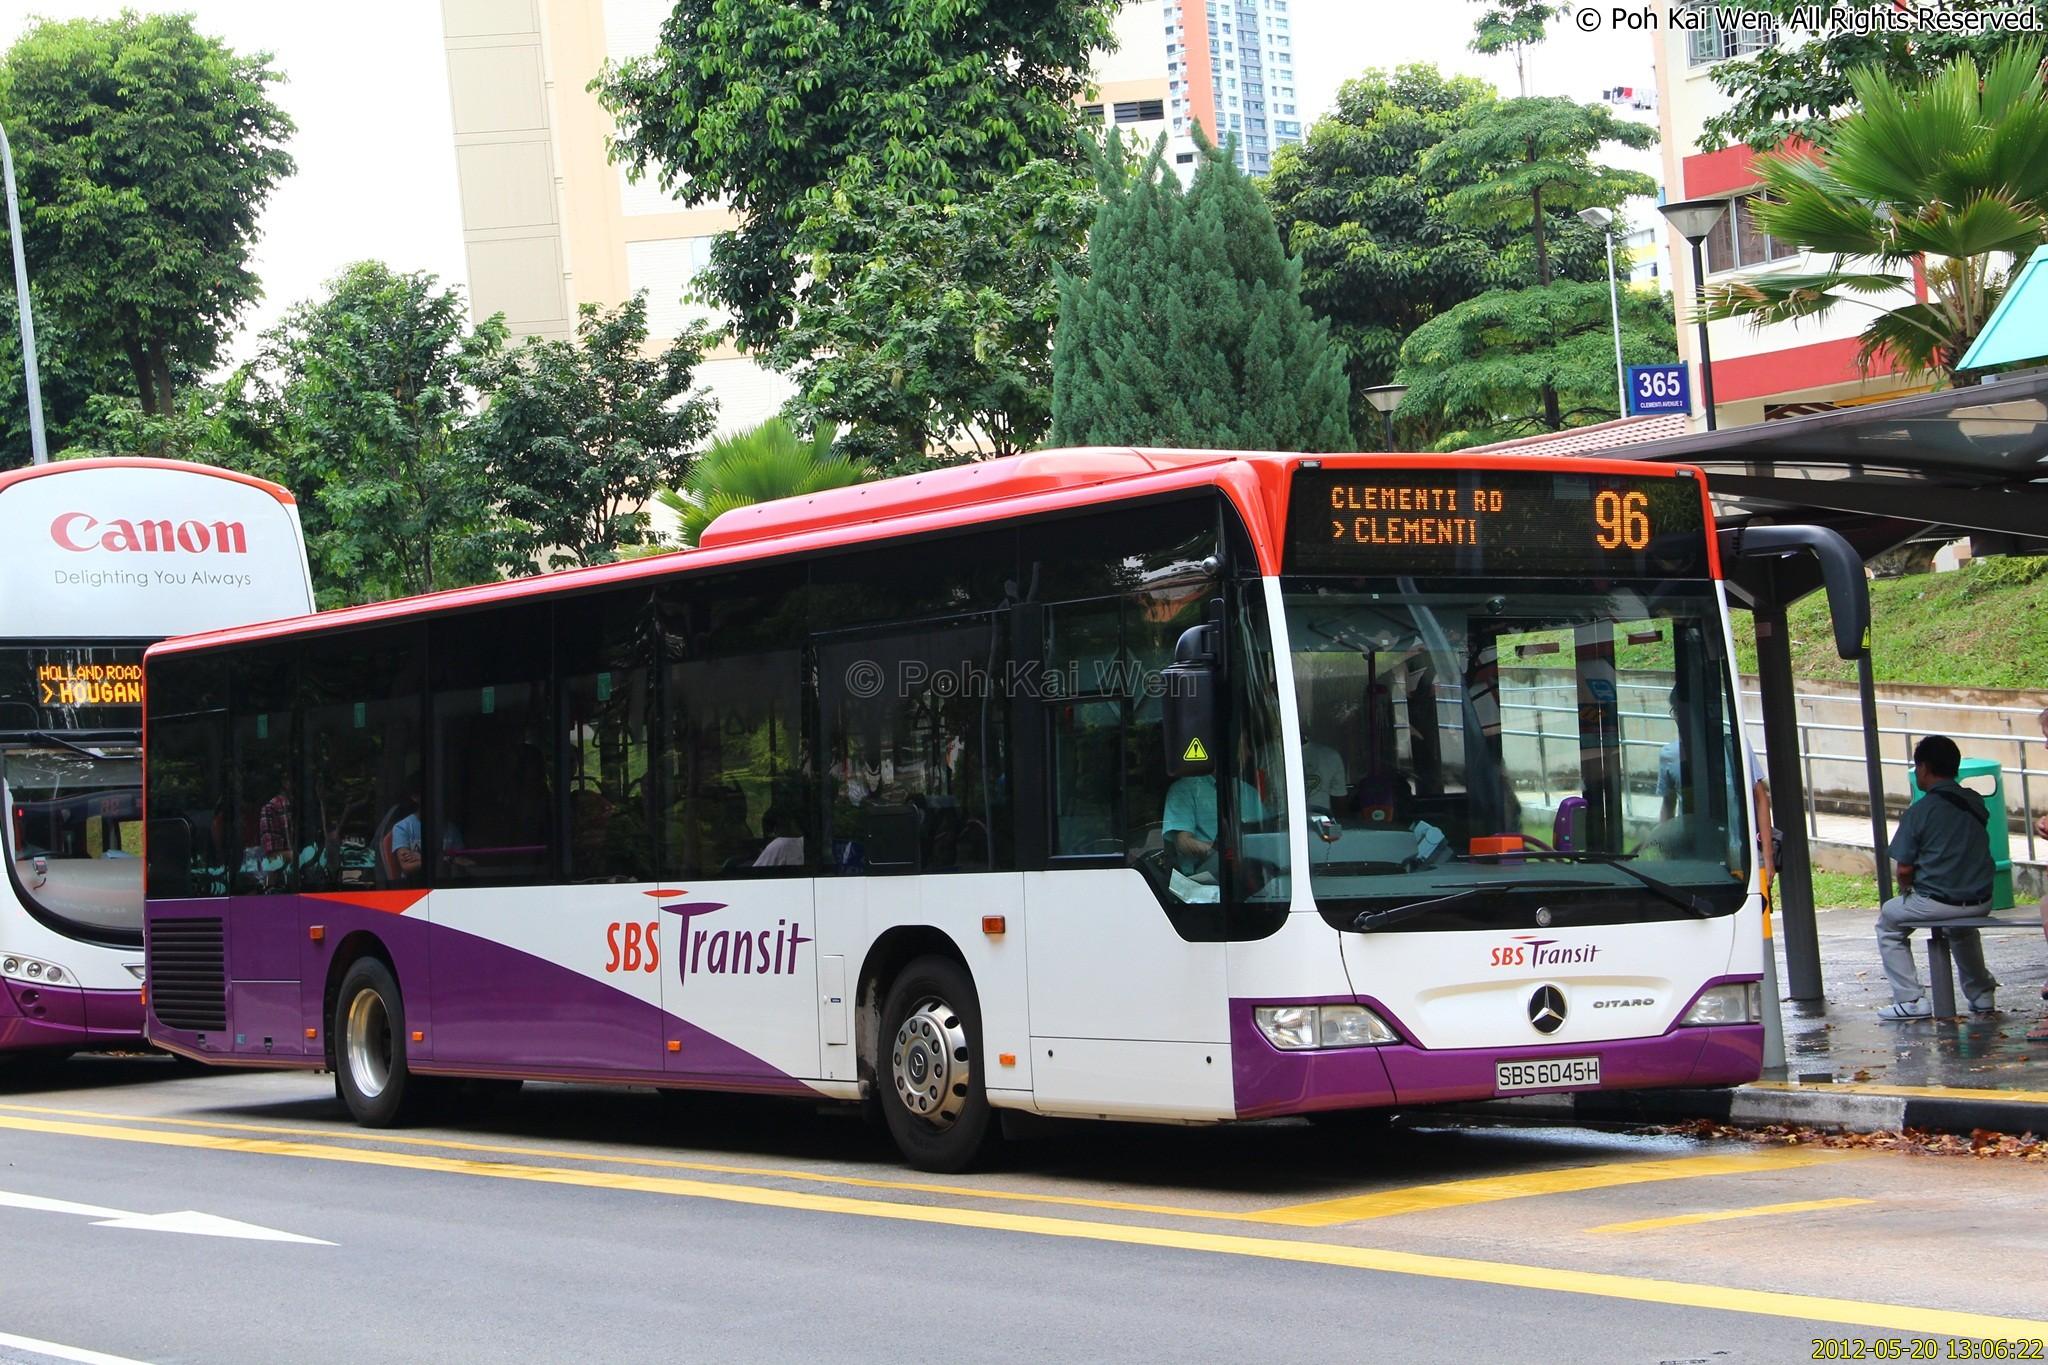 Sbs transit bus service 96 land transport guru for Mercedes benz sugar land service